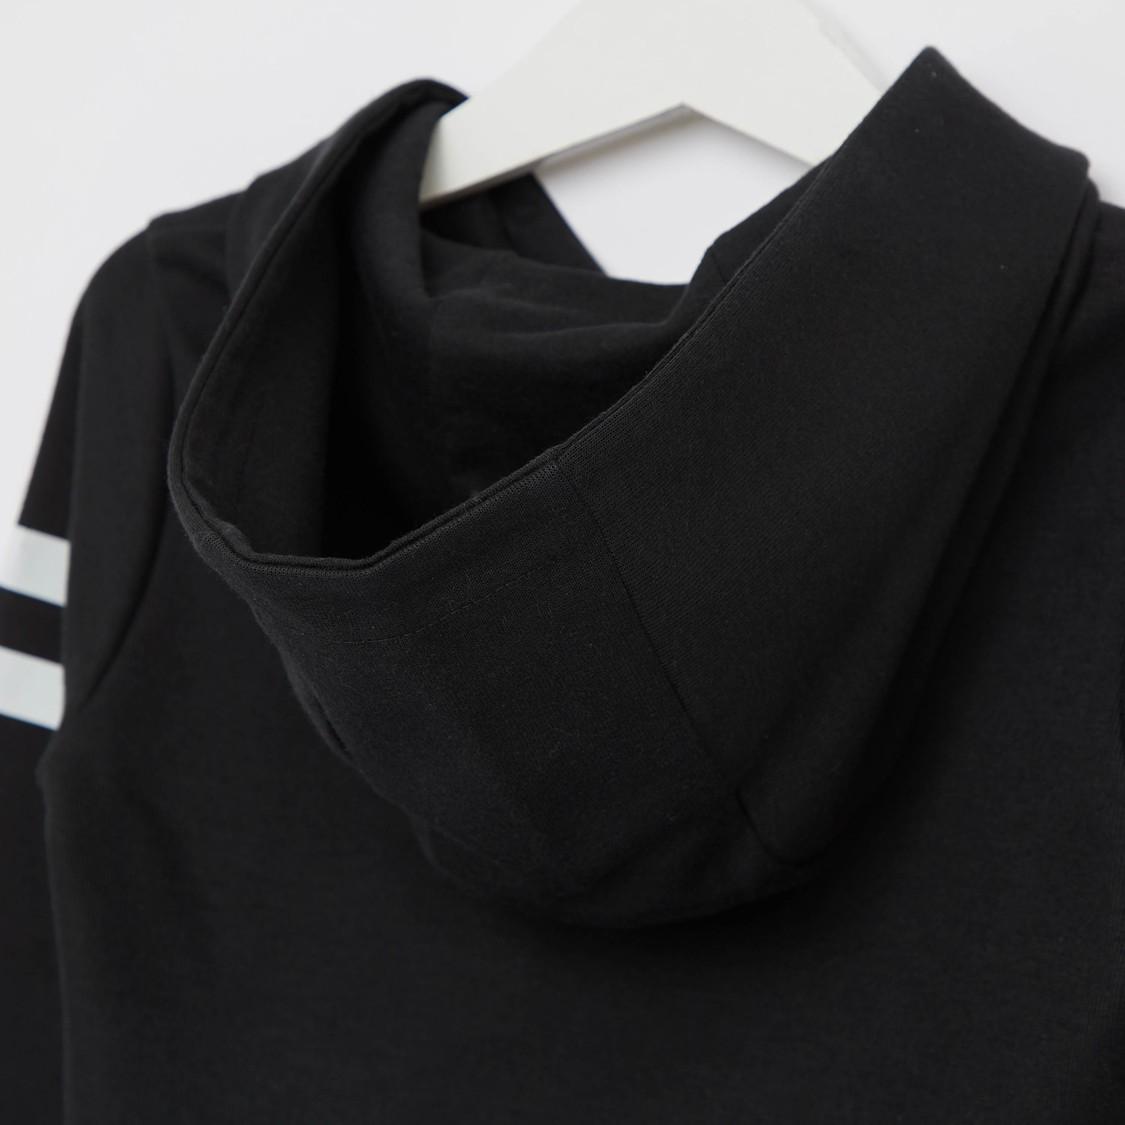 Sequin Detail Hoodie with Long Sleeves